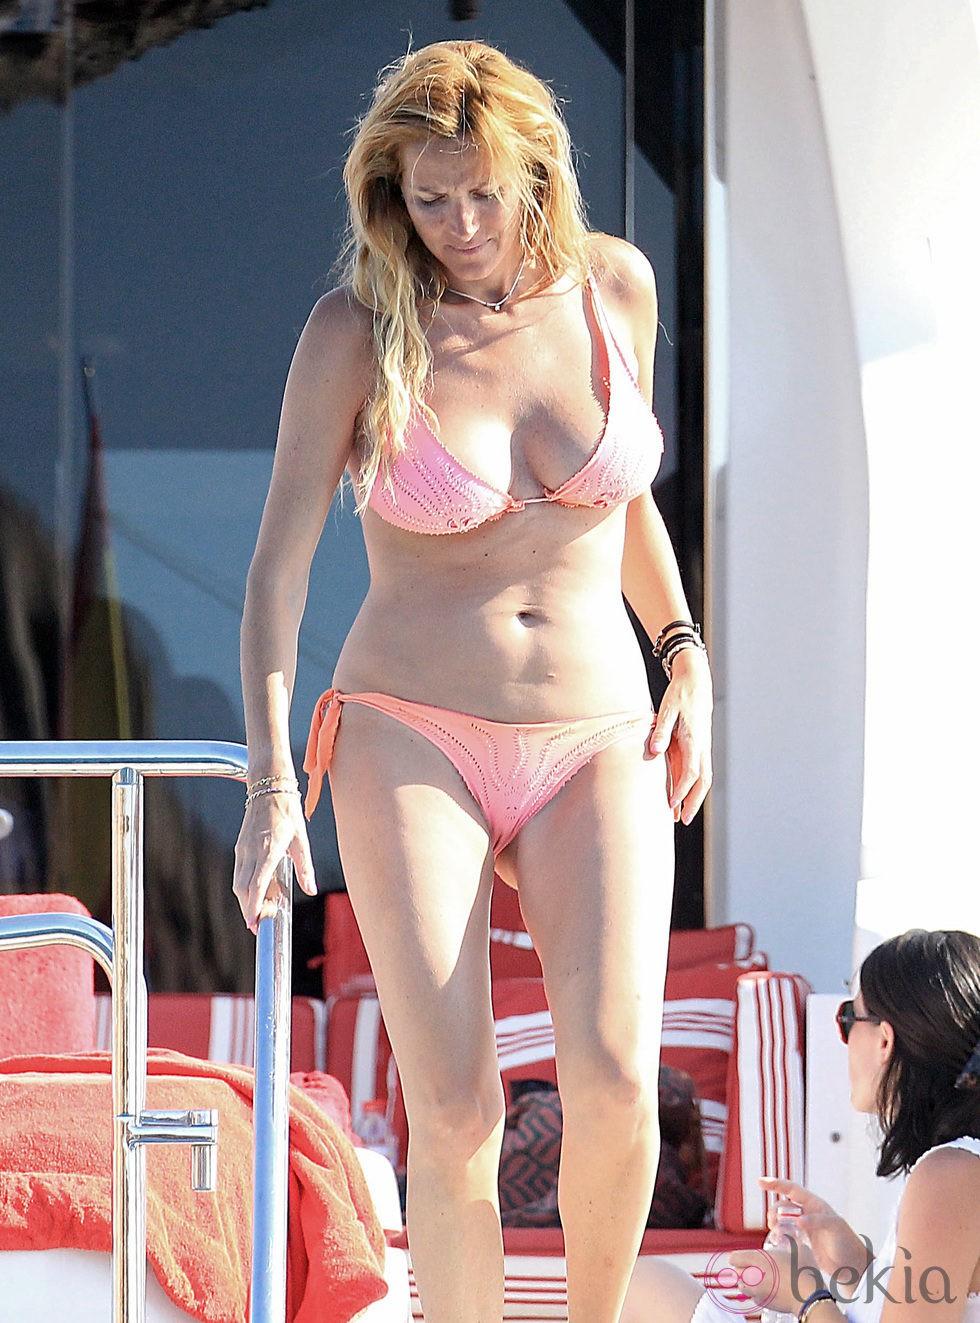 Compras de navidad bikini store 4 - 5 2